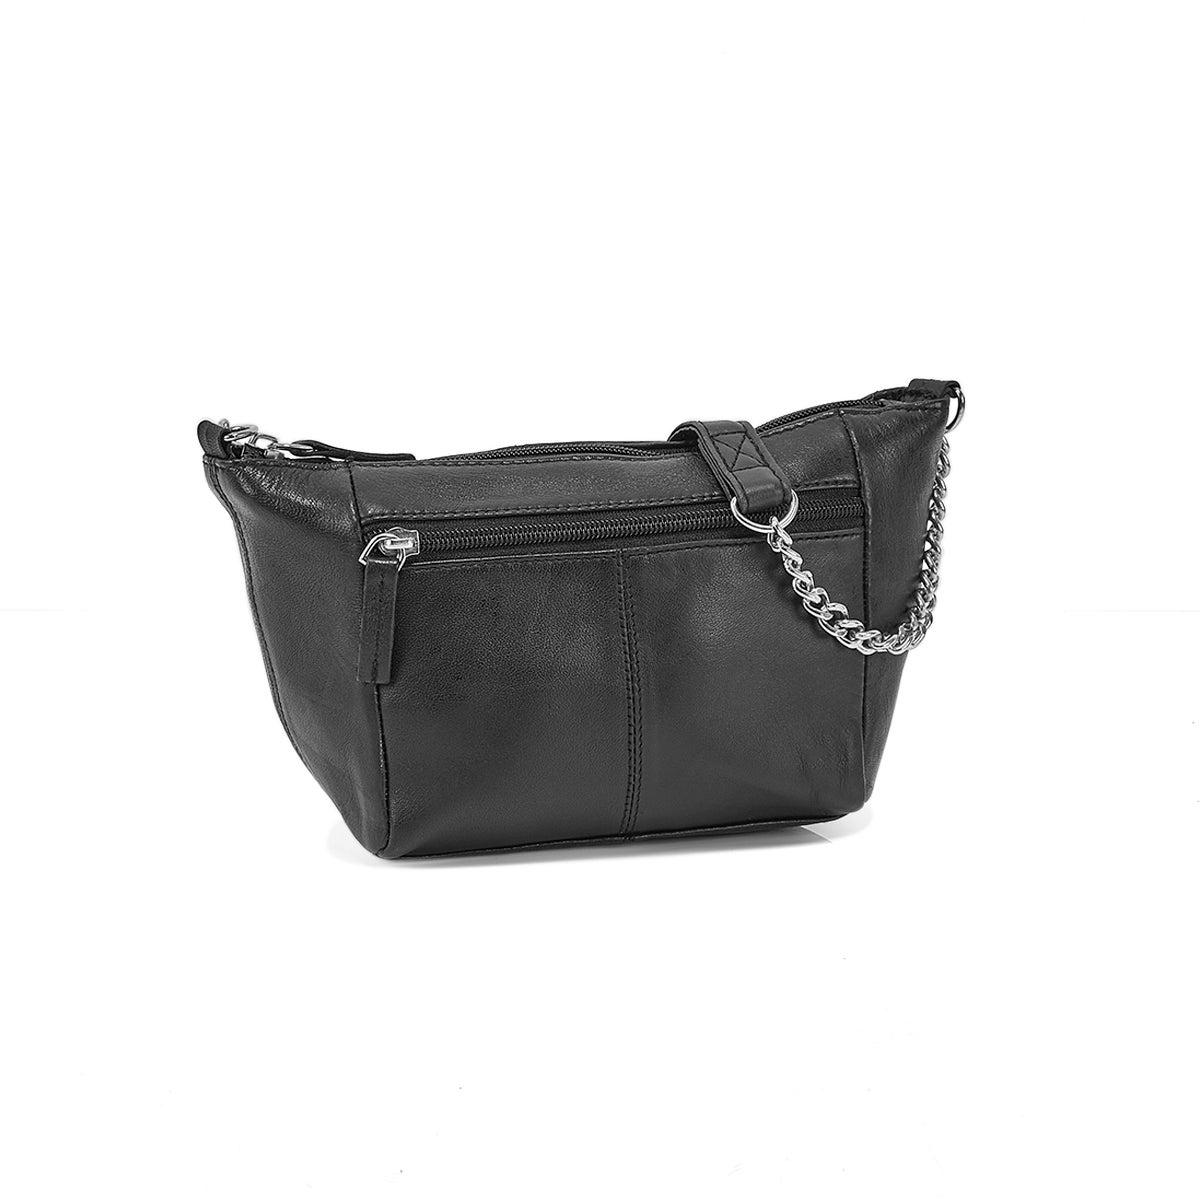 Lds black sheep leather crossbody bag